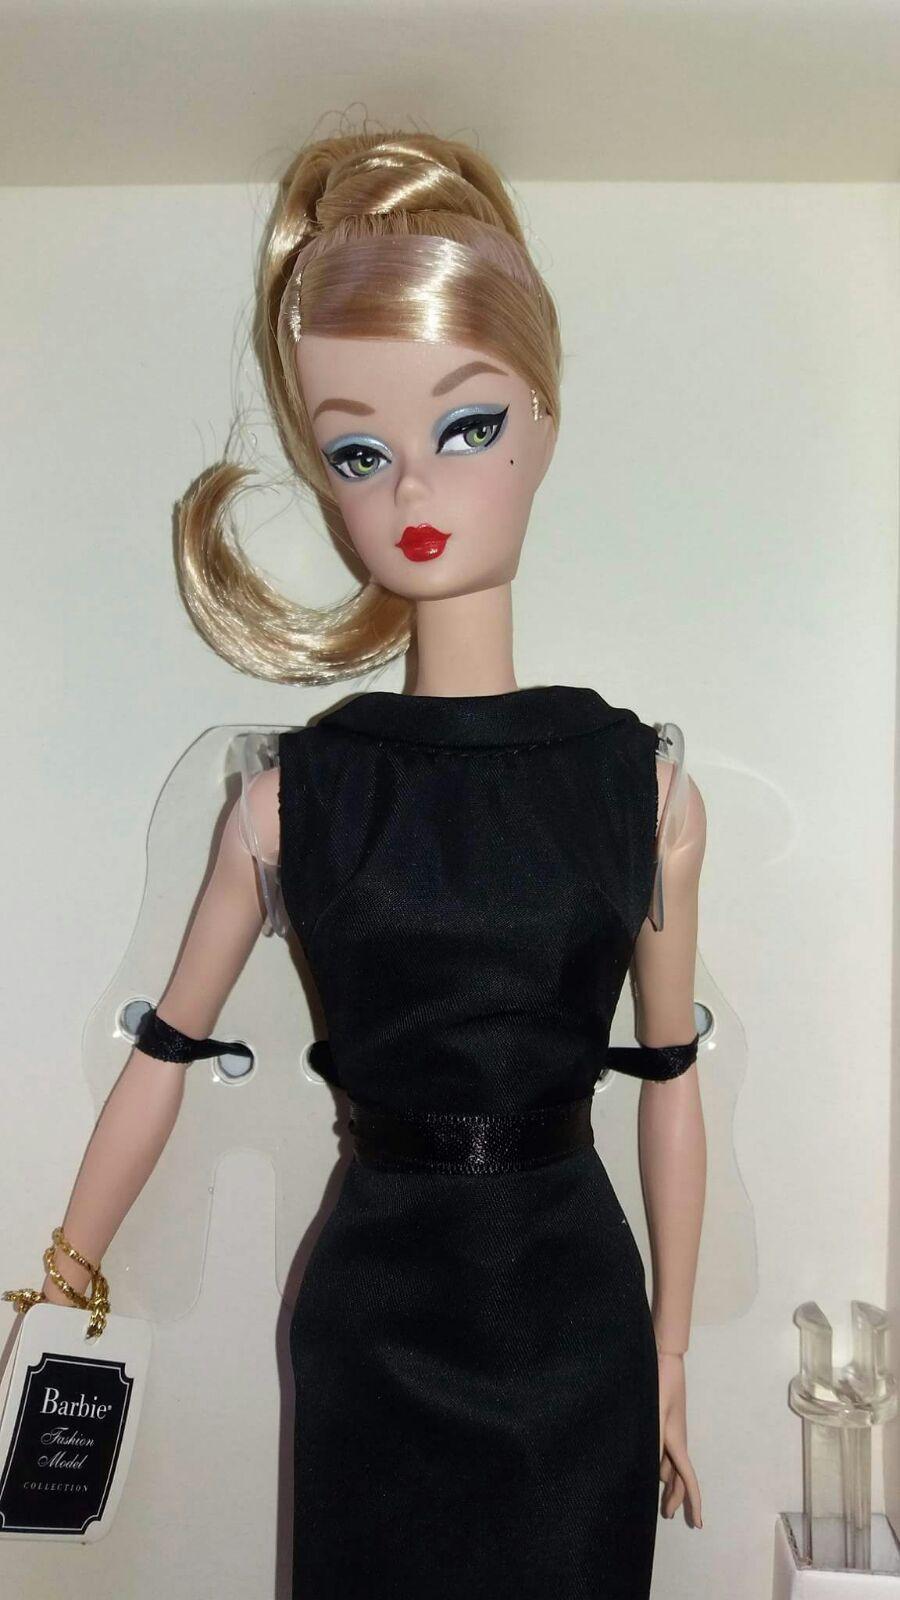 329745f263d8 Barbie Silkstone Classic Black Dress 2016 Portuguese Doll Convention Lisbon  | eBay